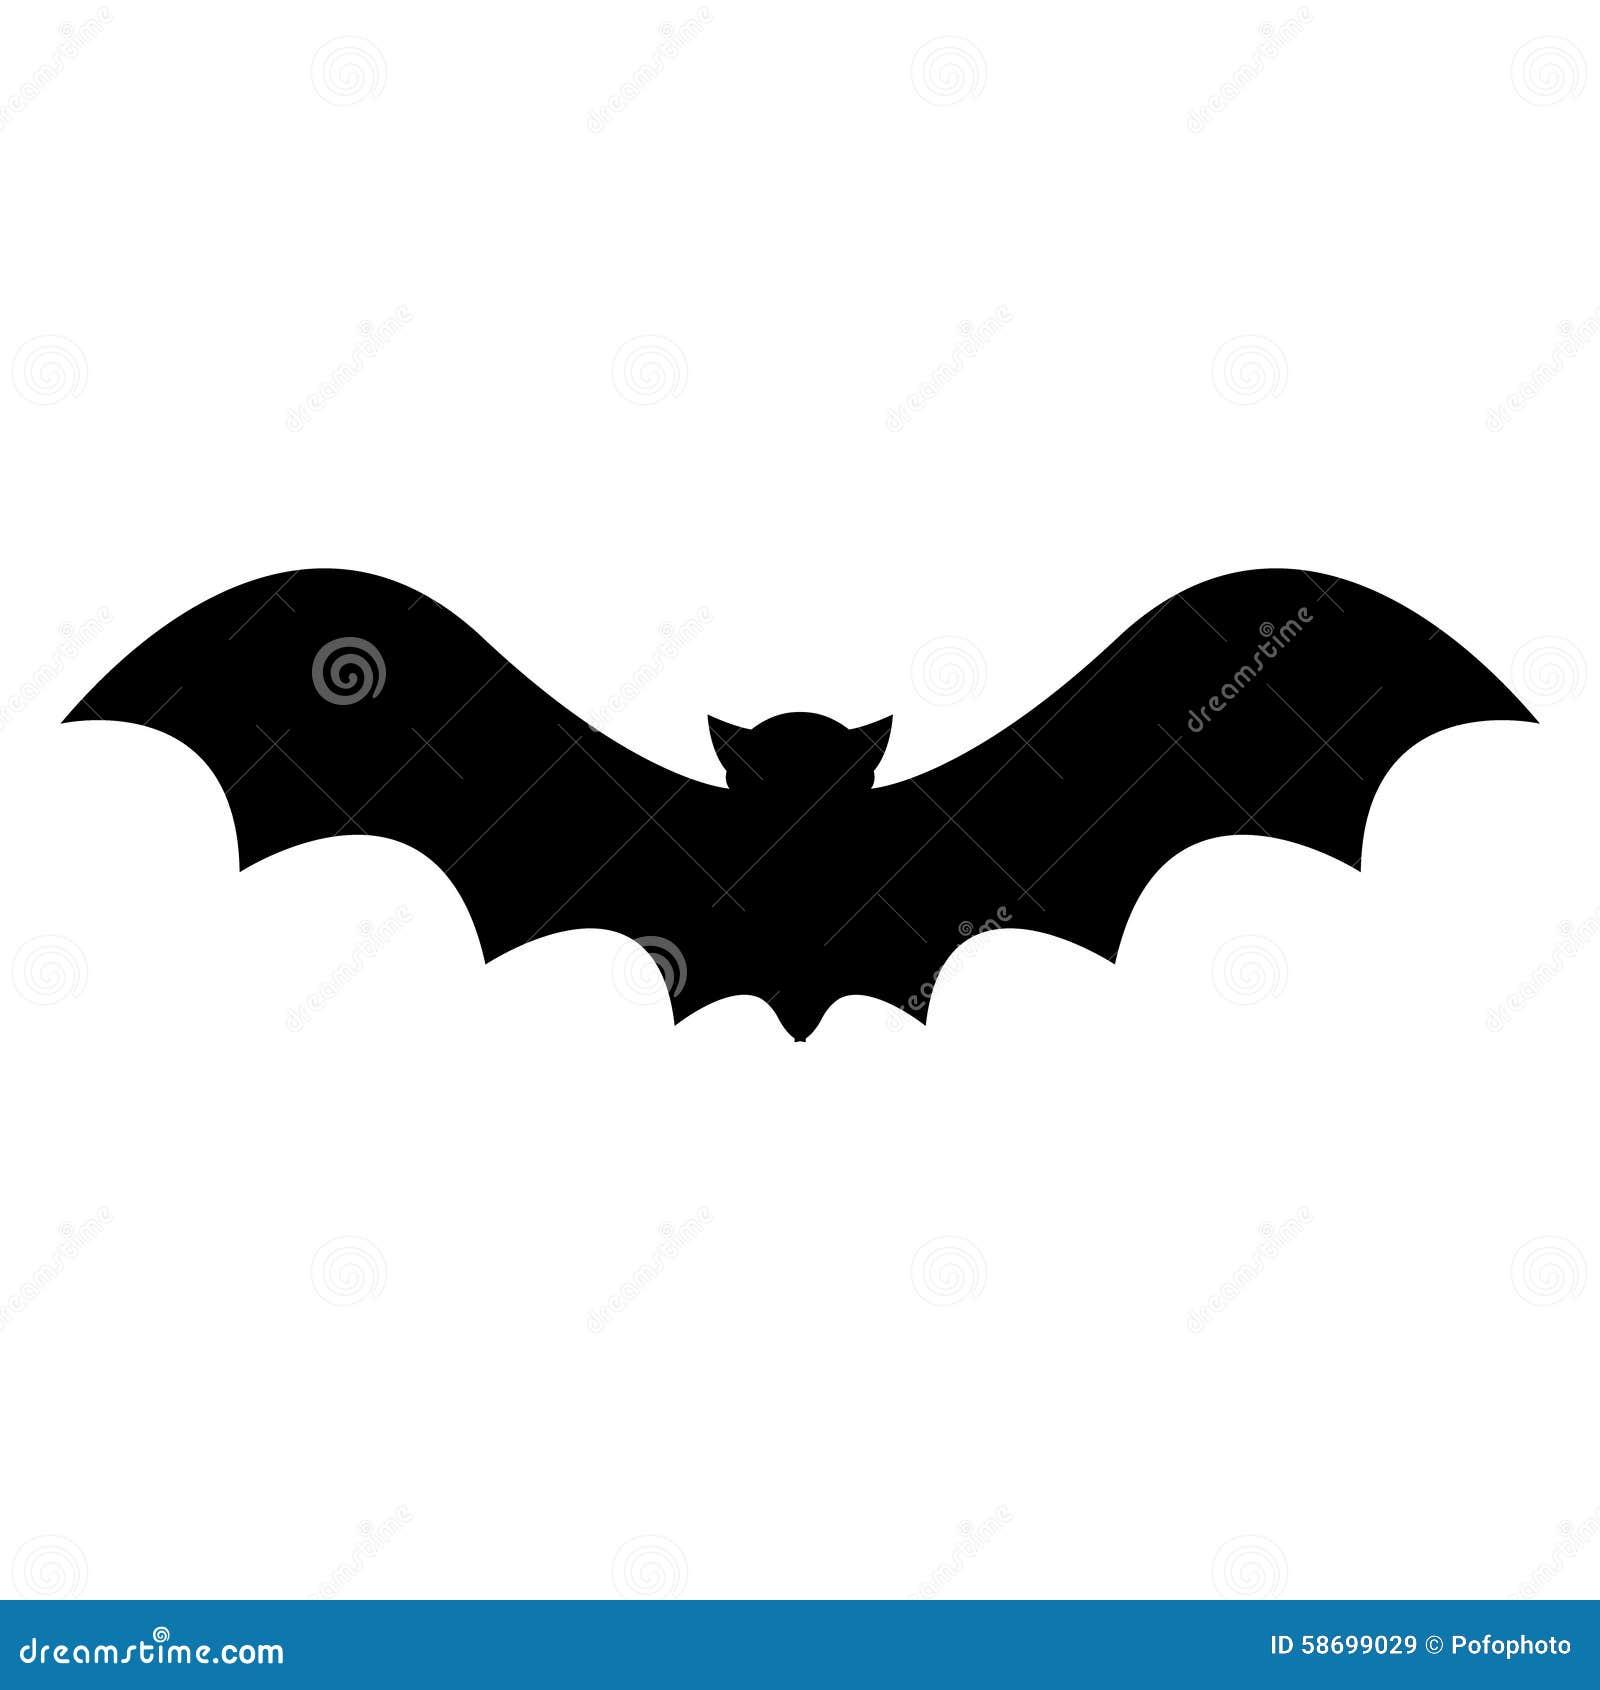 HALLOWEEN BAT VECTOR Stock Photo - Image: 58699029